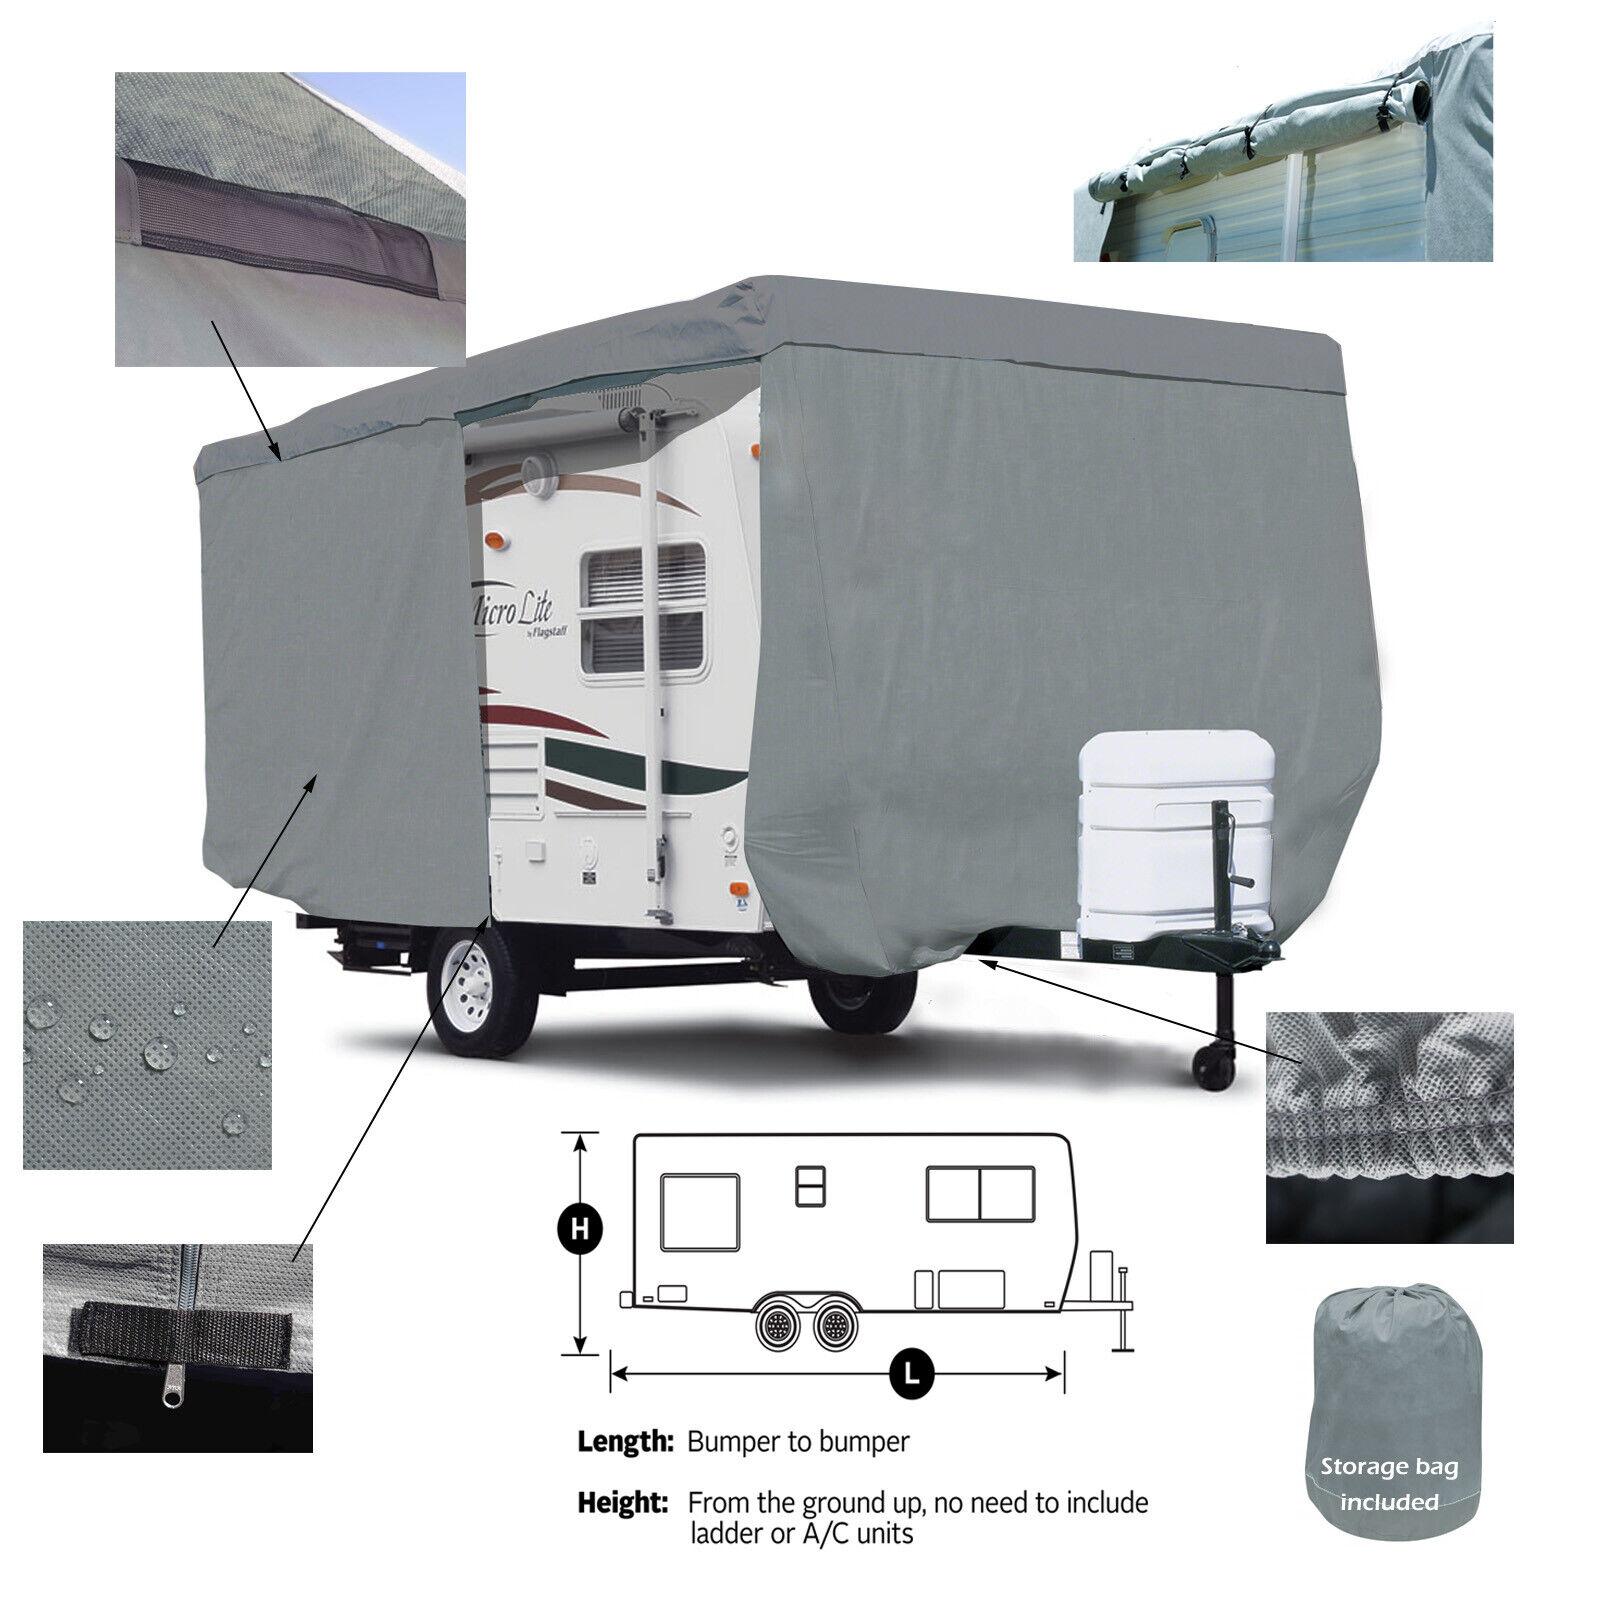 Deluxe Aristocrat Lo Liner 16 Camper Travel Trailer Cover For Sale Online Ebay